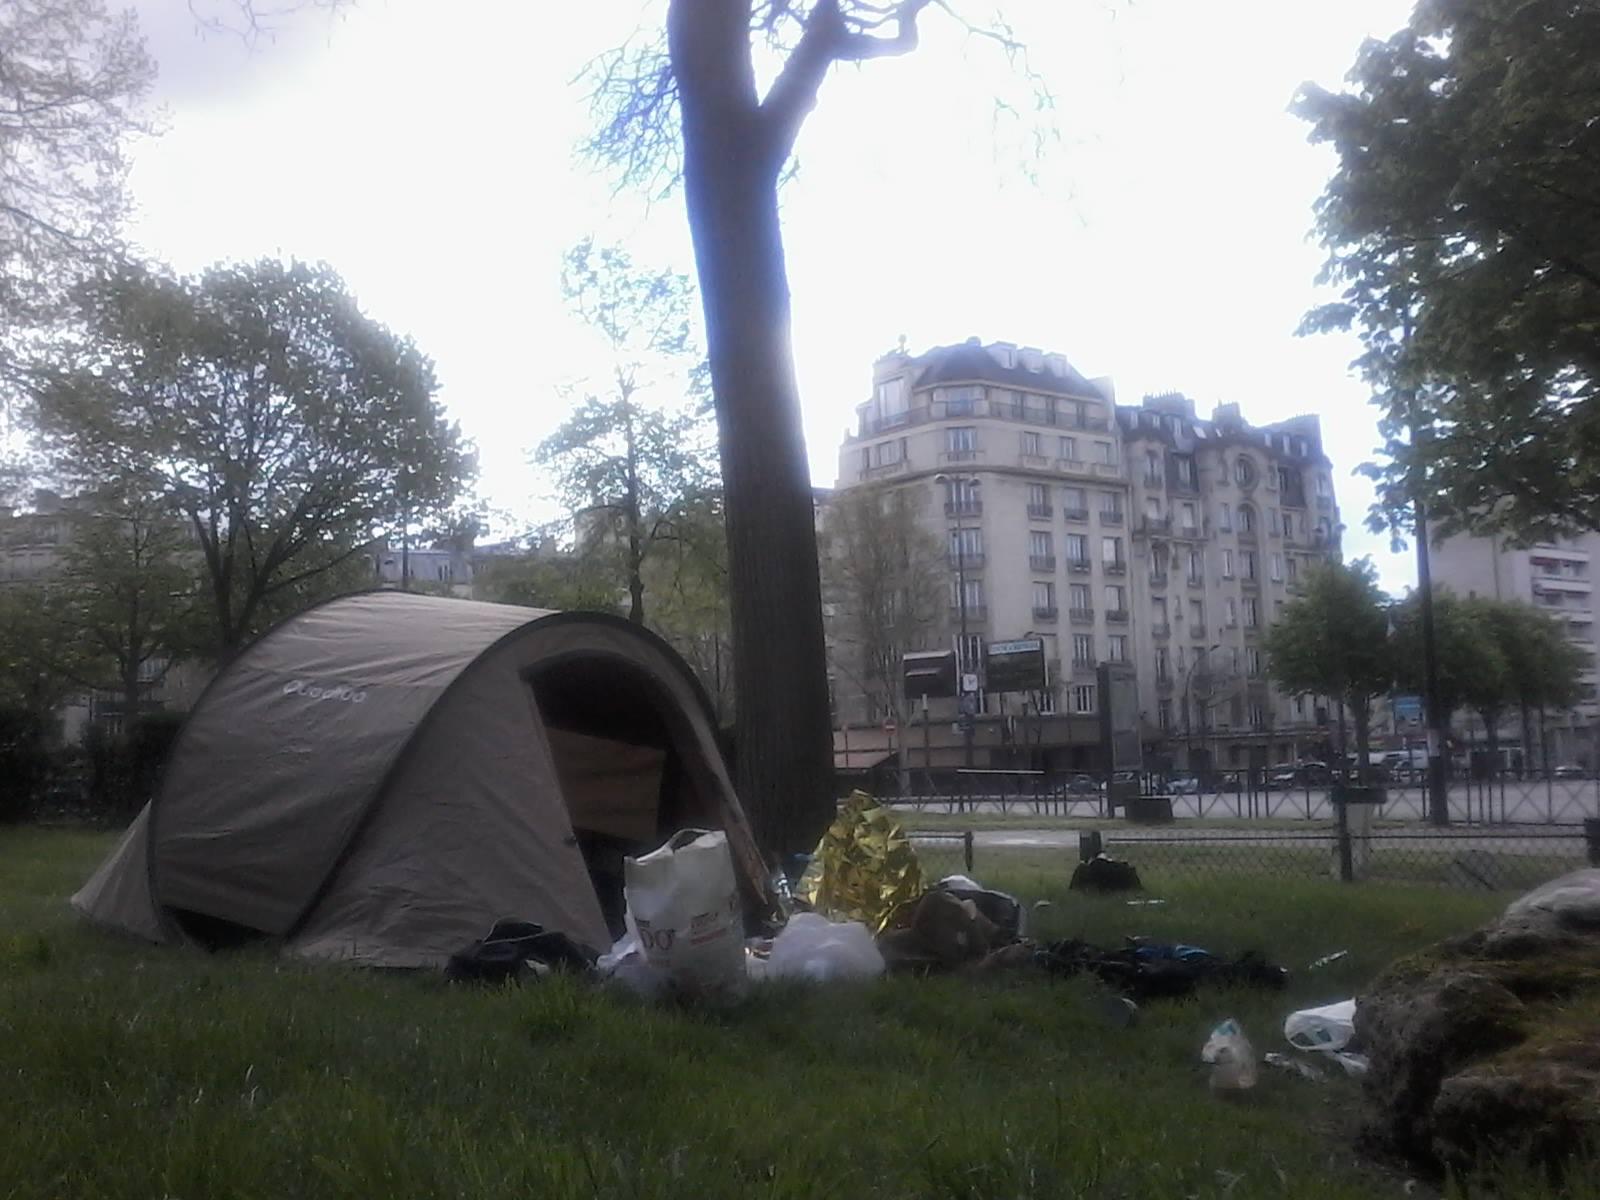 Jacques Sayagh acampando